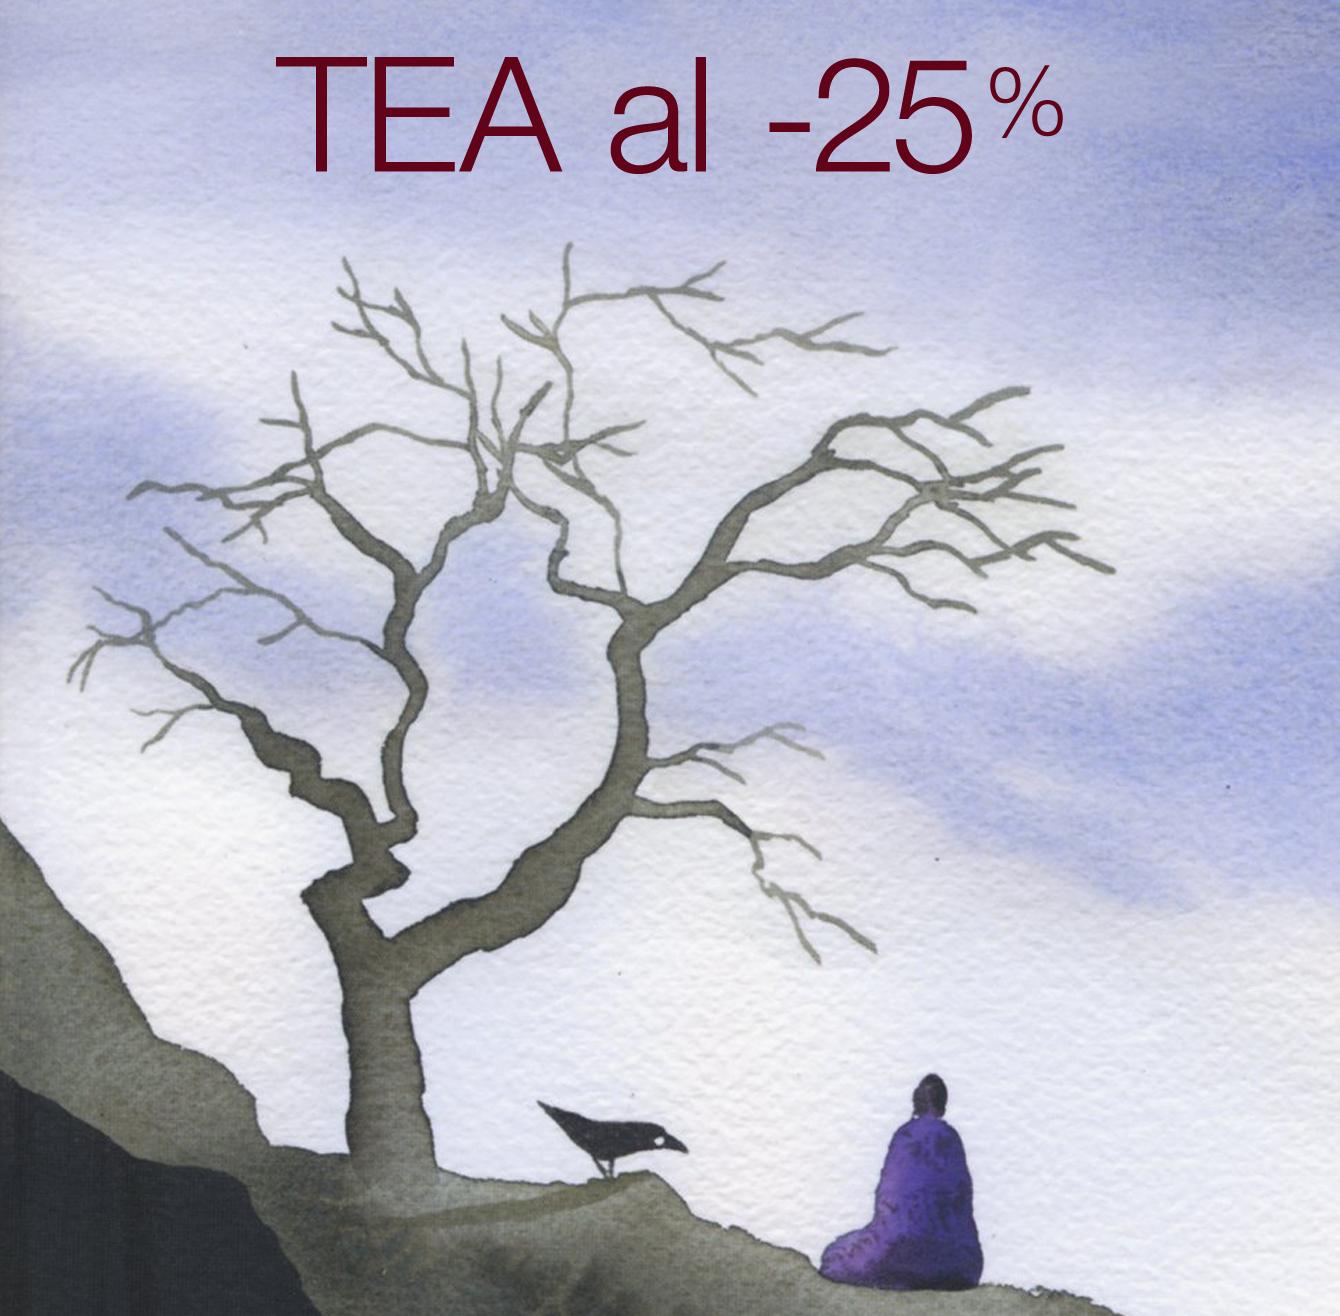 TEA al -25%